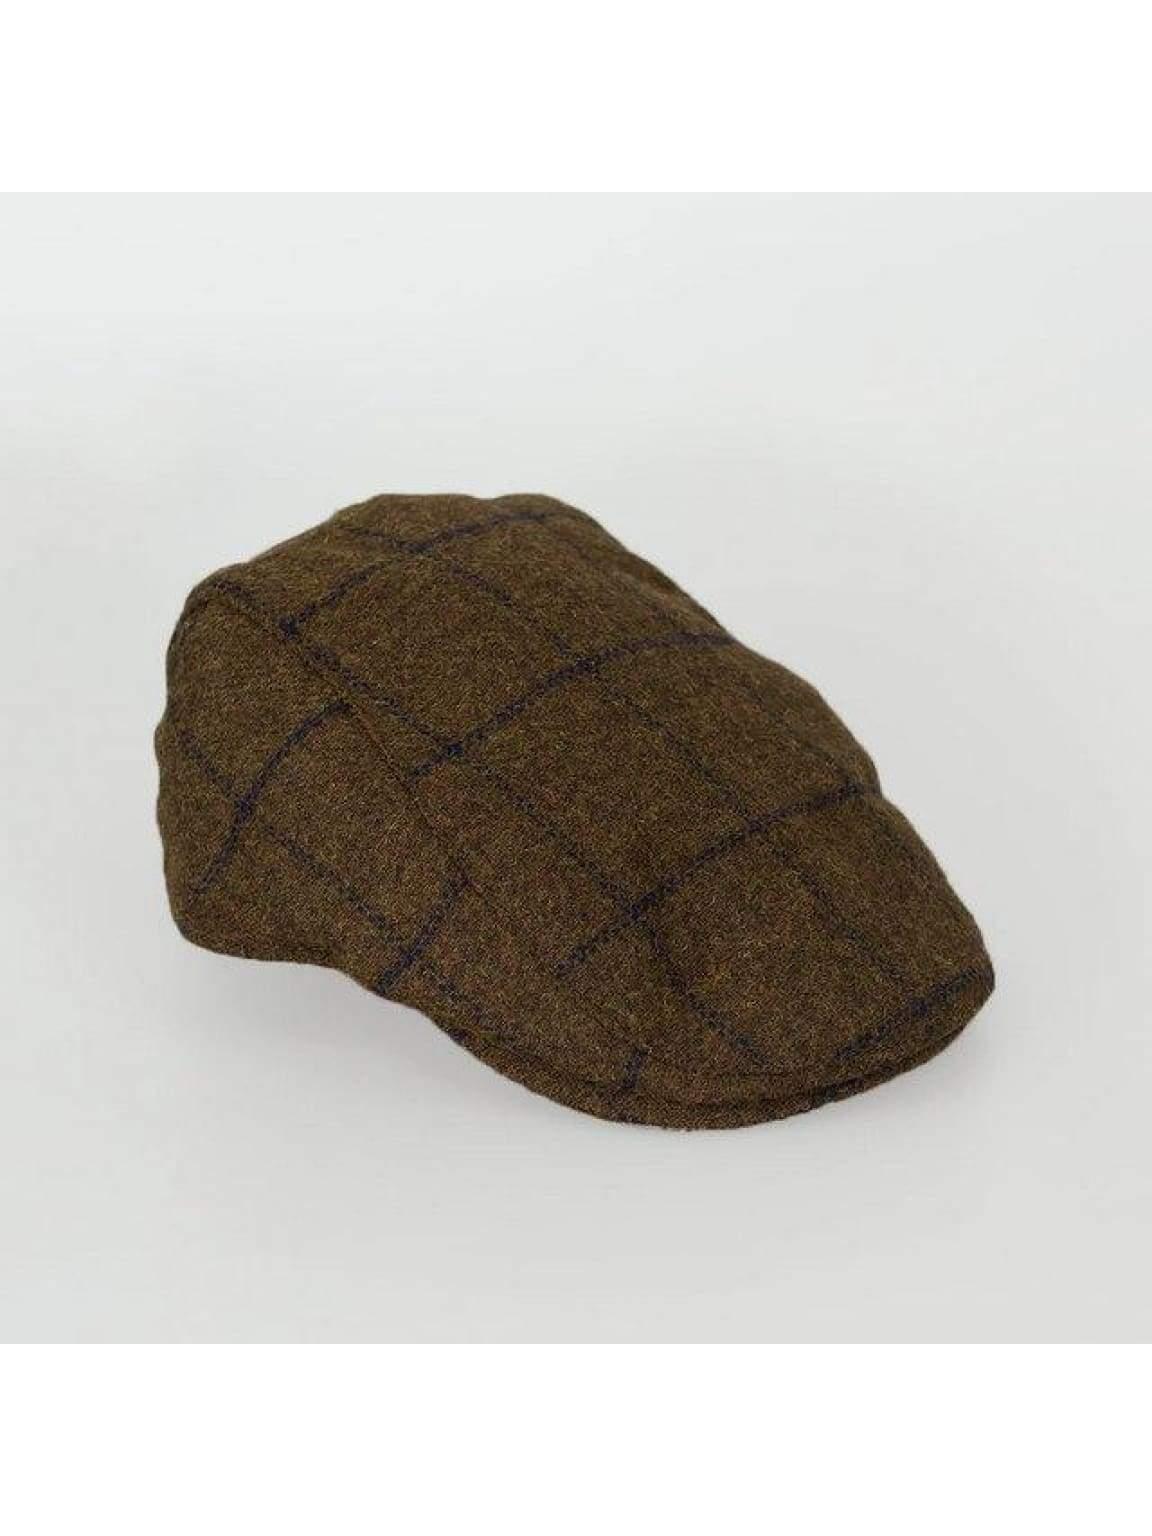 Kemson Tobacco Check Flat Cap - S/M - Accessories